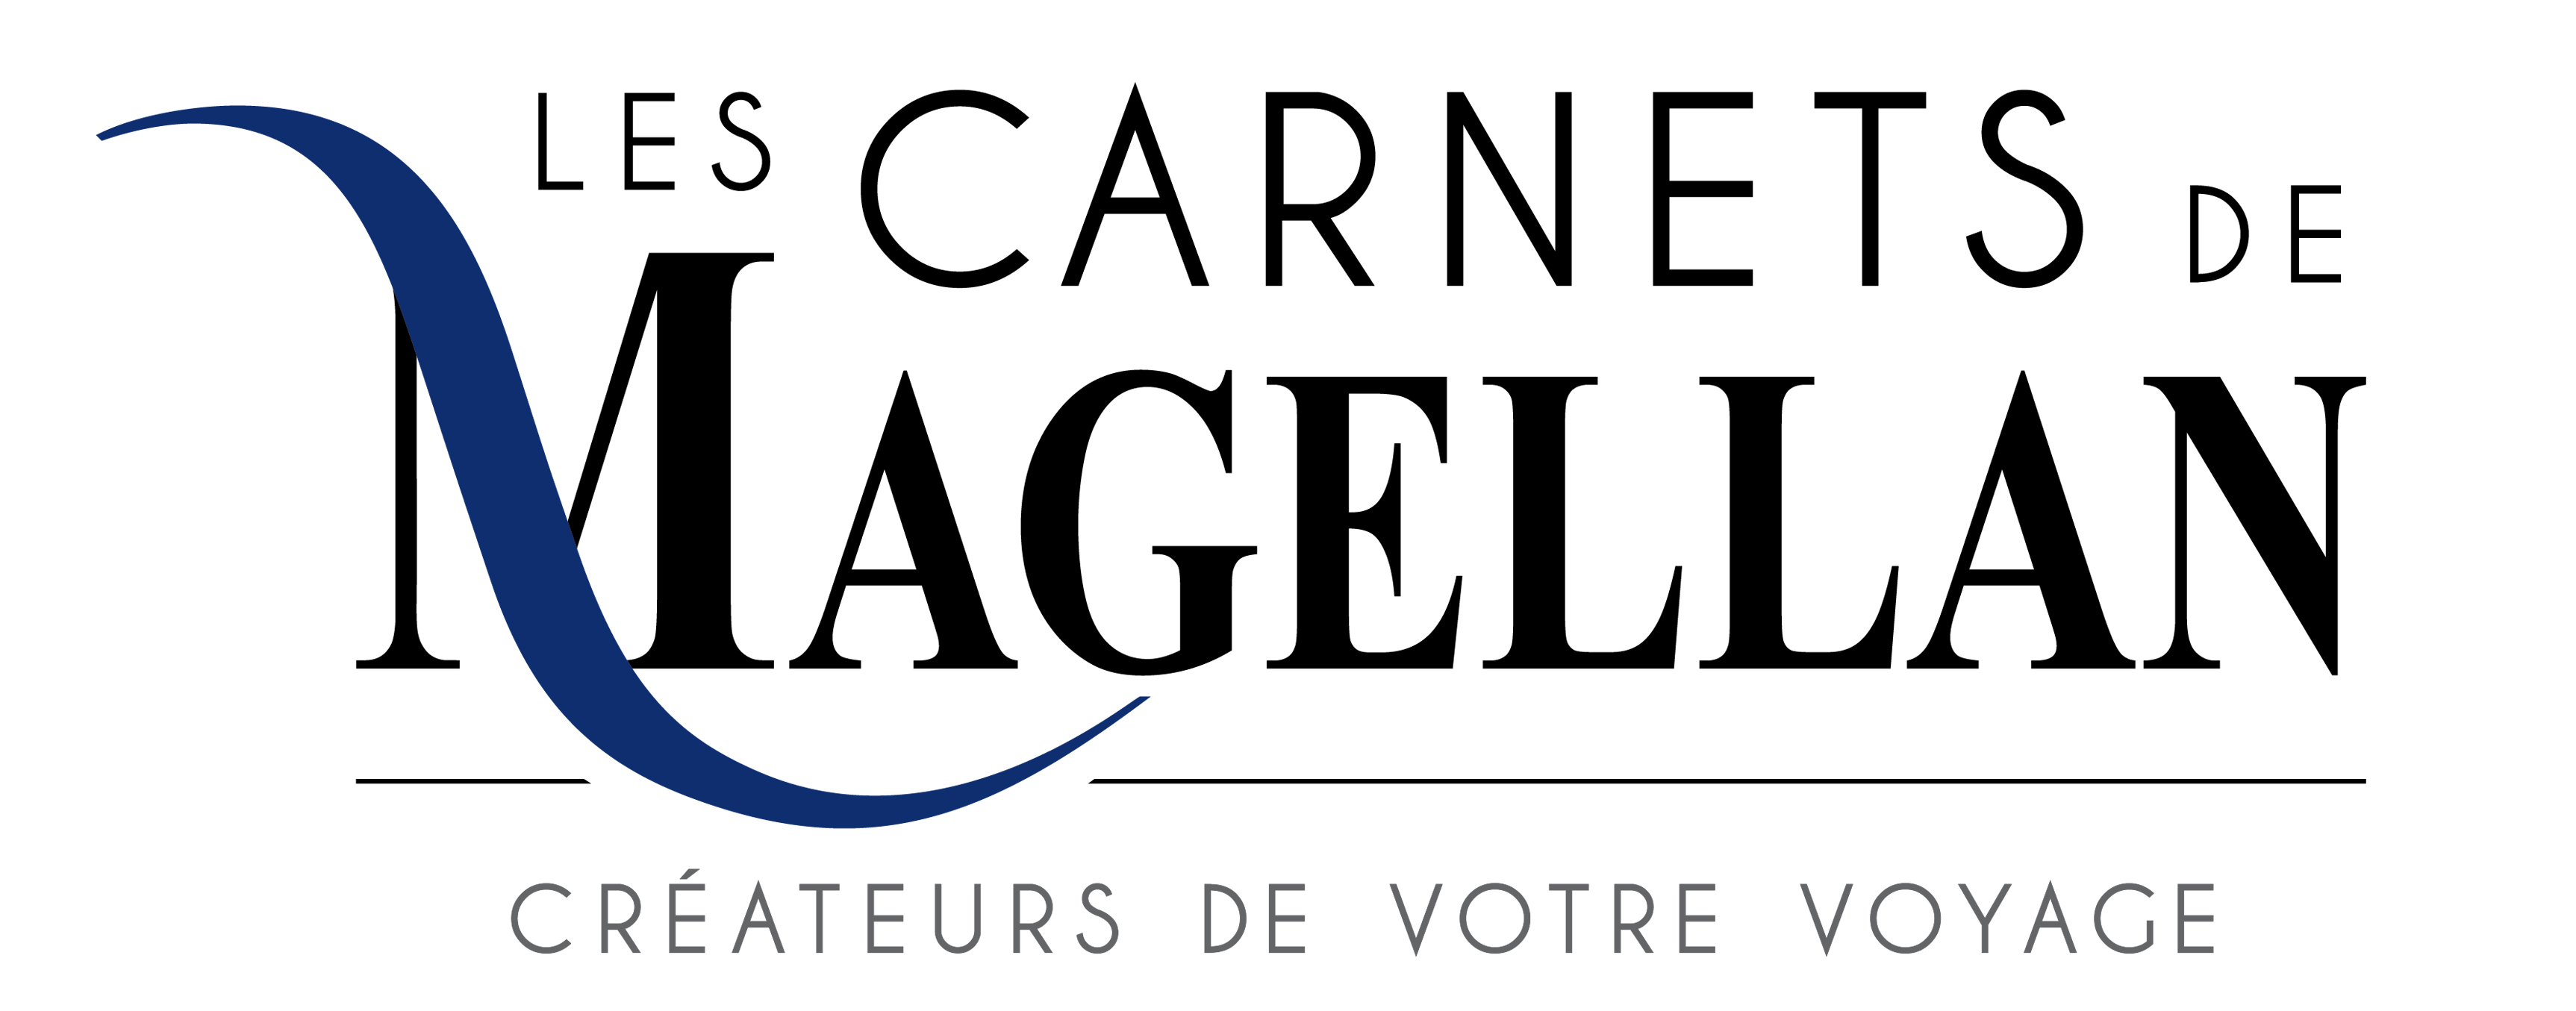 https://www.tourmag.com/docs/emploi/LOGO-carnets-de-magellan_RVB.jpg